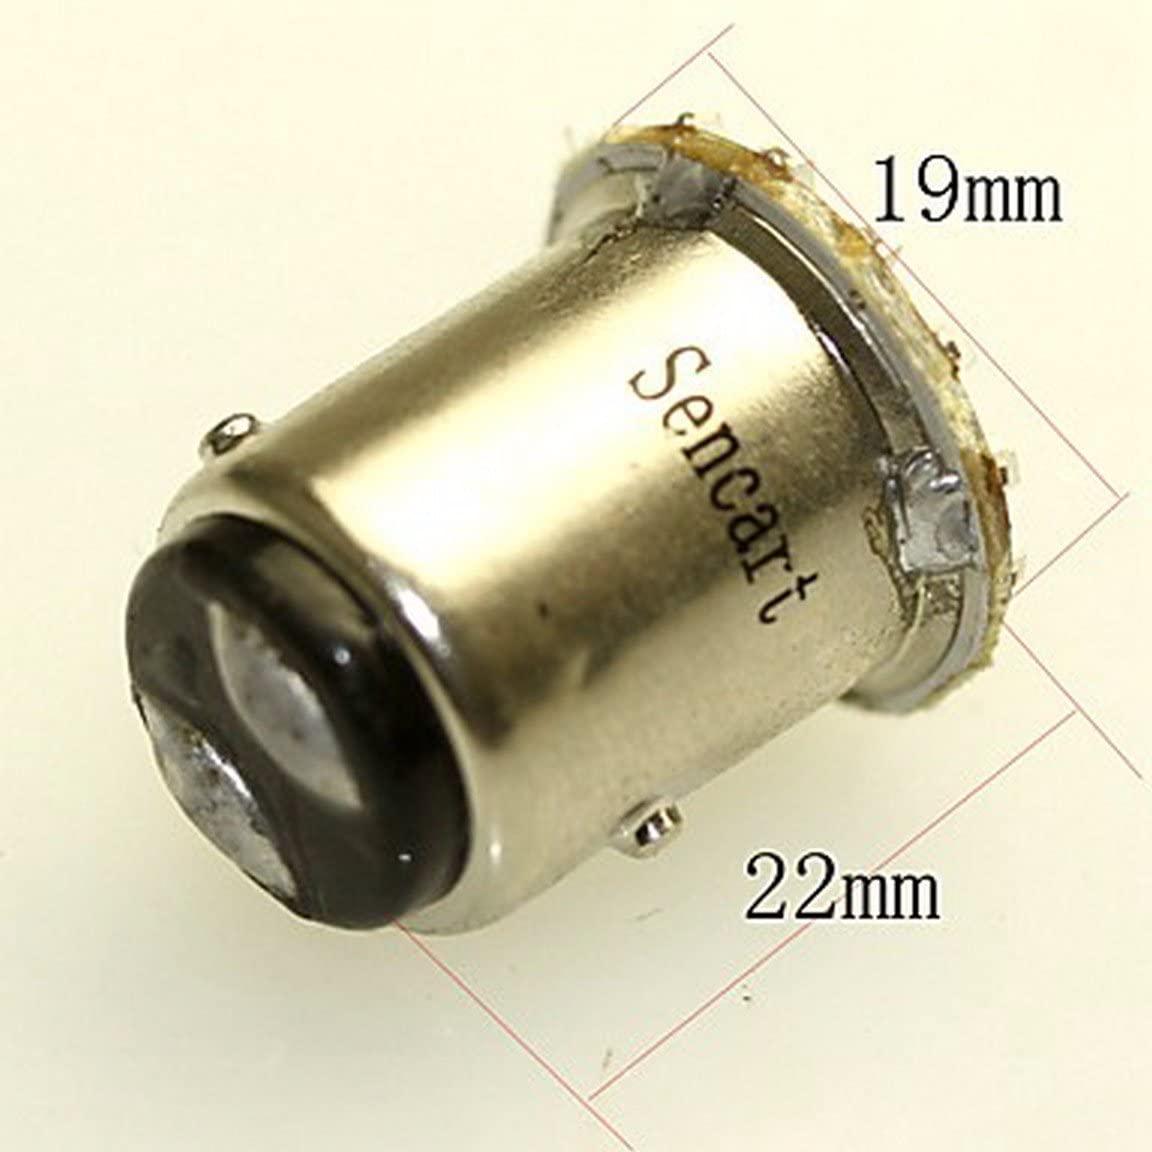 Ueannryer 10pcs 1156 P21W BA15S R10W 22x3014 LED car daytime running light Auto Tail Side Indicator Lights Parking Lamp Bulbs,Green,1157